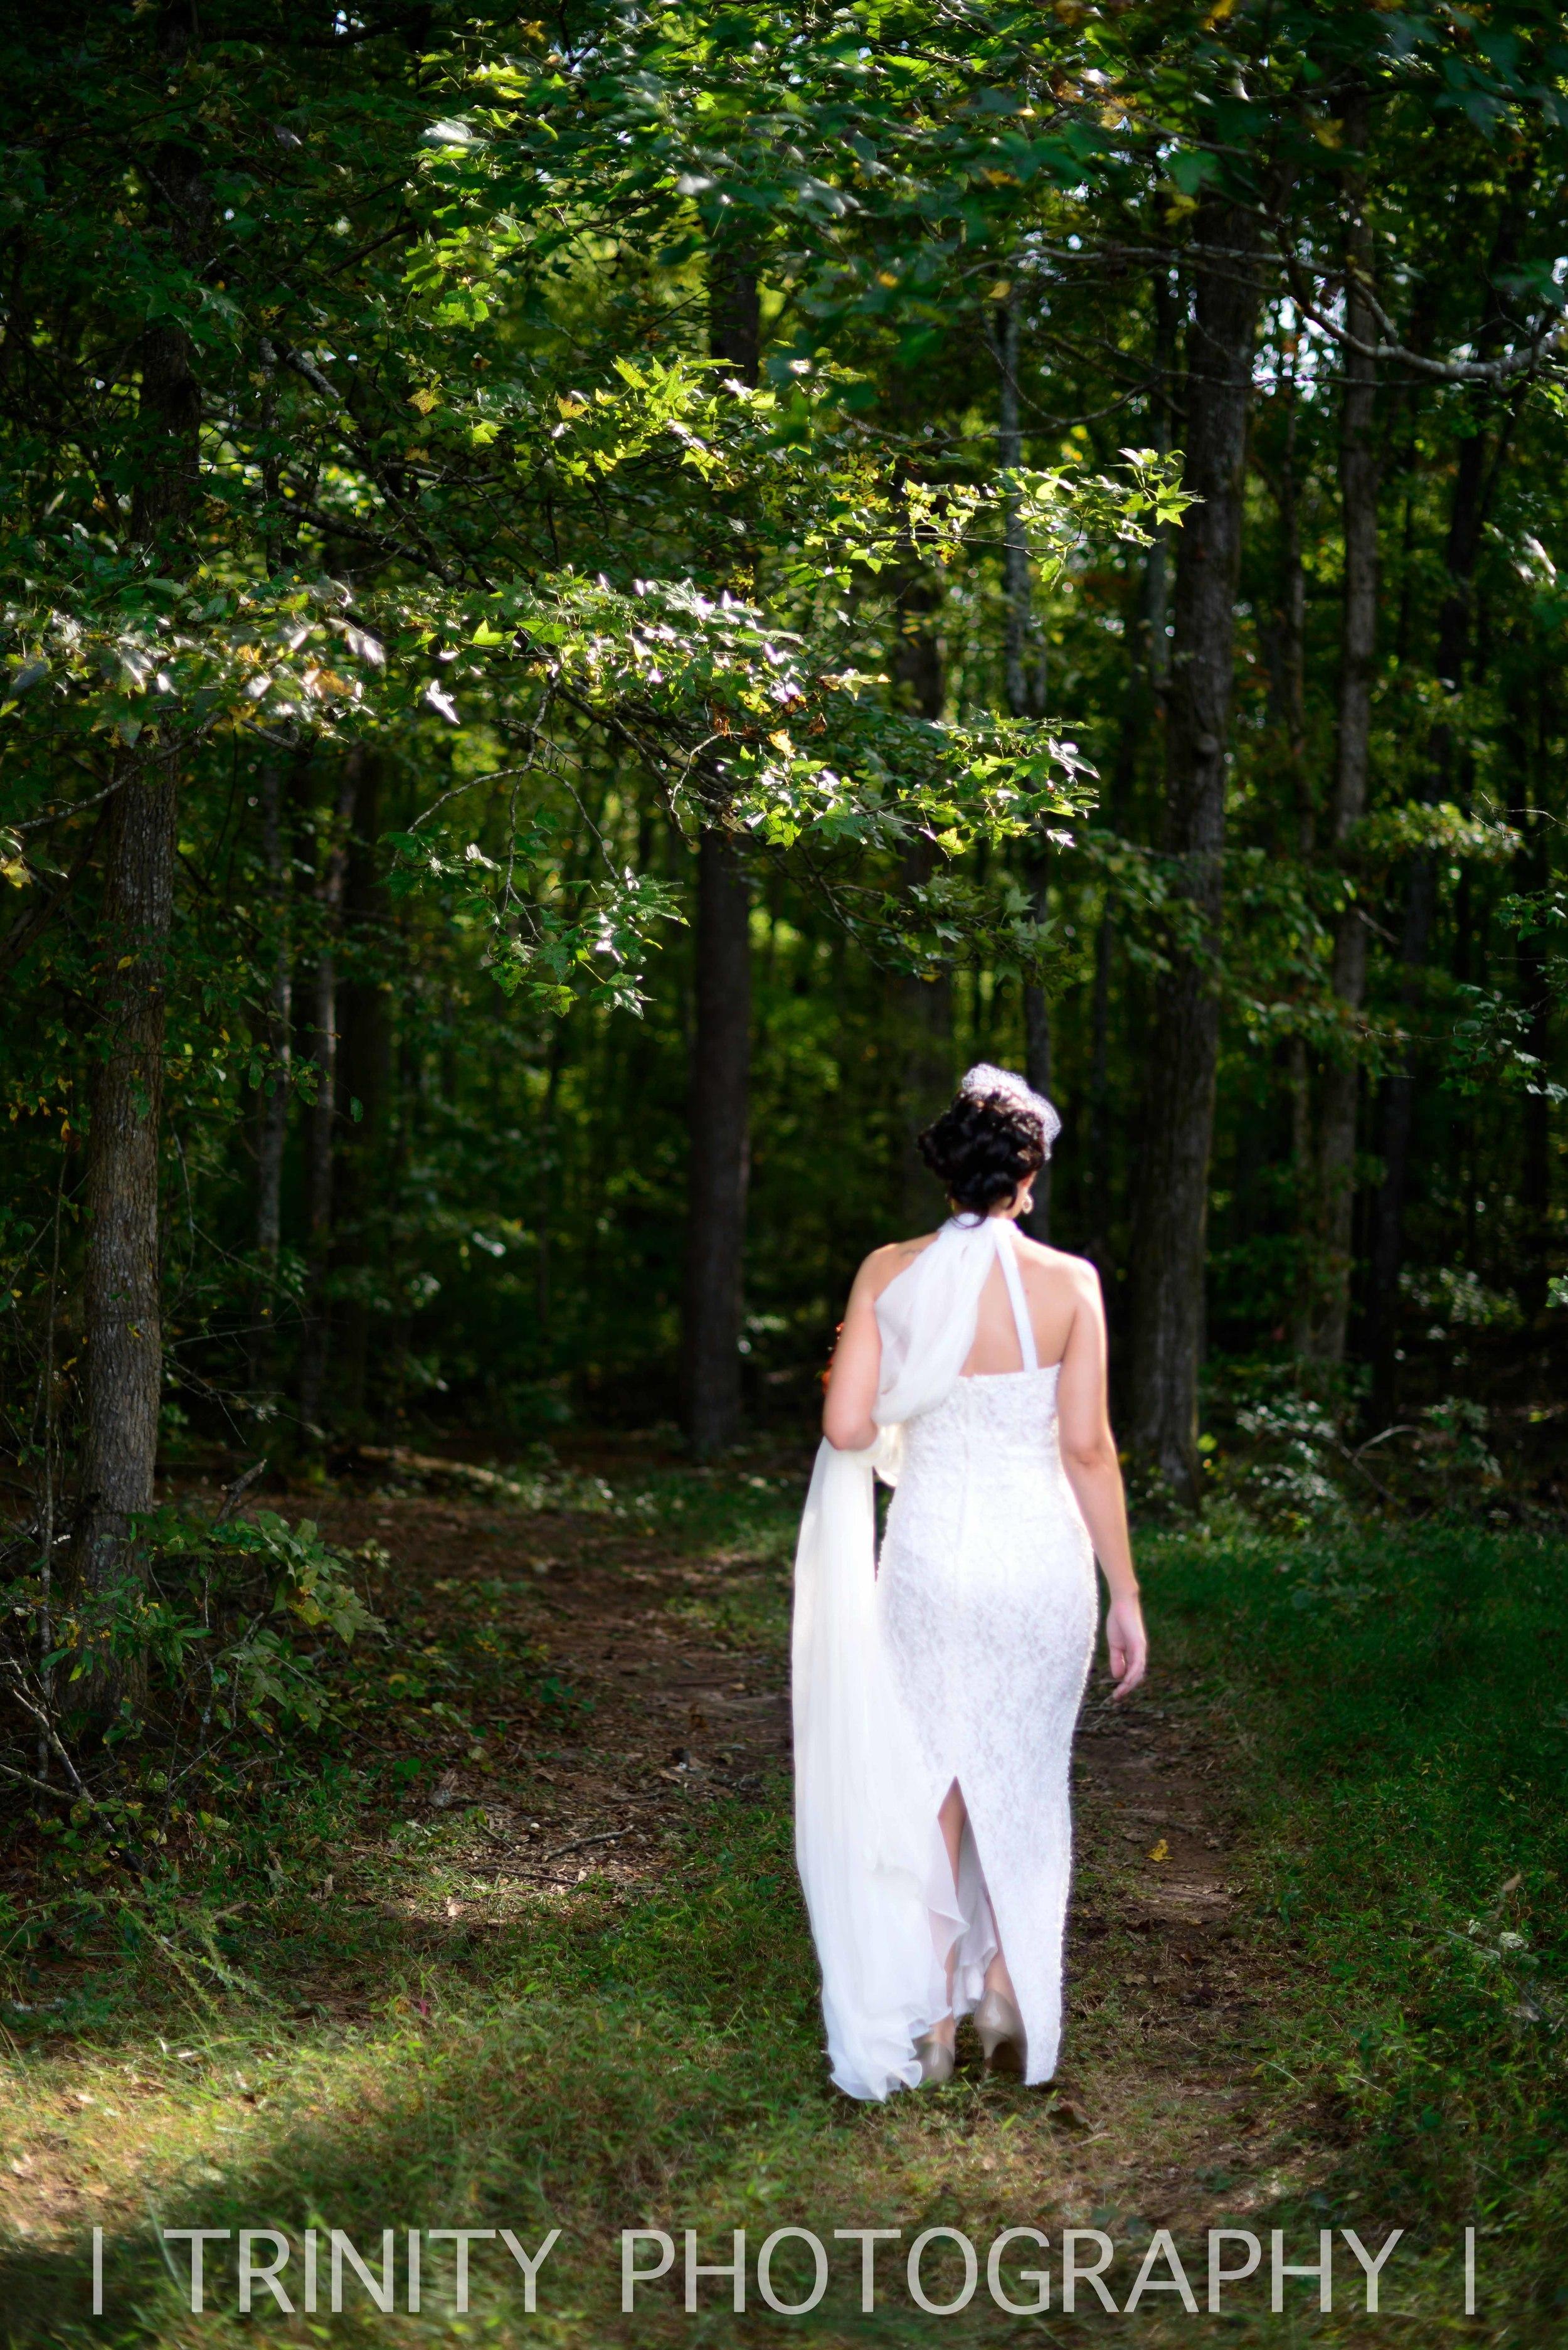 Walking to her Wedding in the Woods